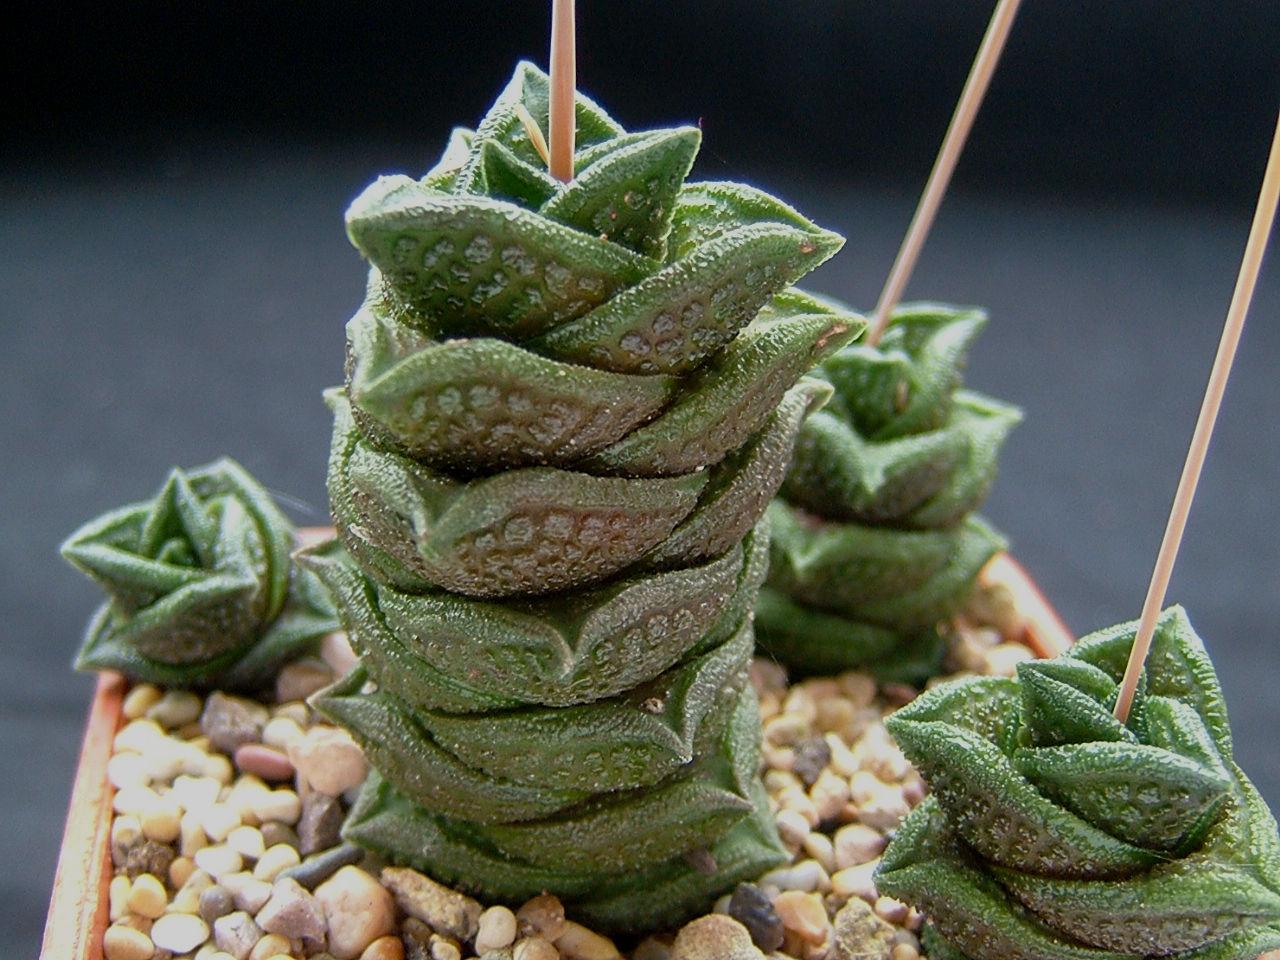 Haworthia nigra(diversifolia) [Beauford West] ex J.Henshaw 2000